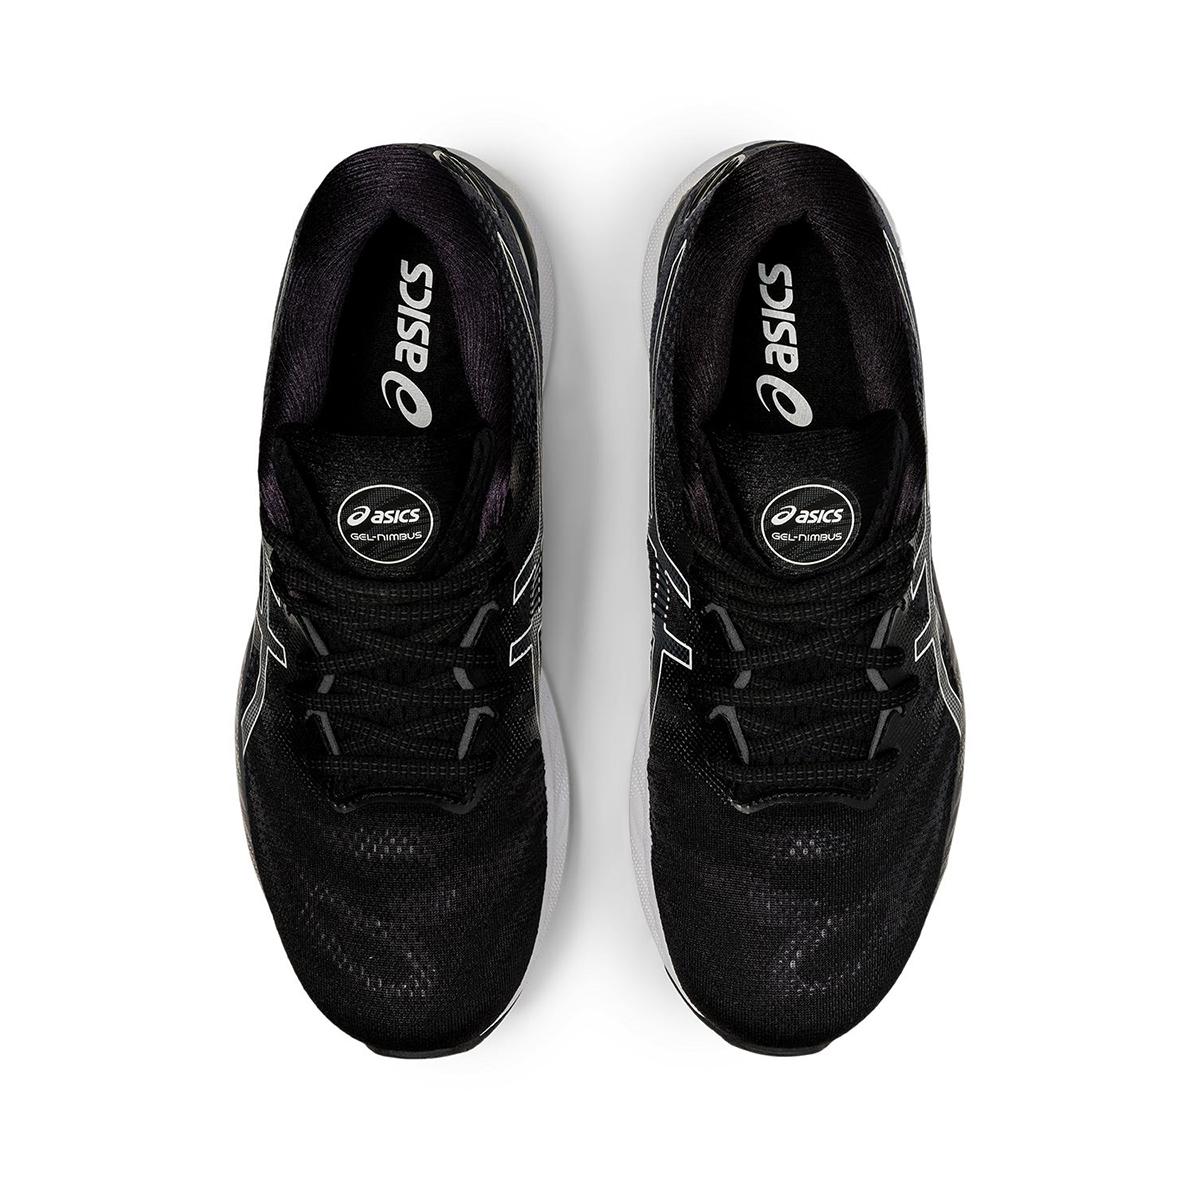 Men's Asics GEL-Nimbus 23 Running Shoe - Color: Black/White - Size: 7 - Width: Regular, Black/White, large, image 5